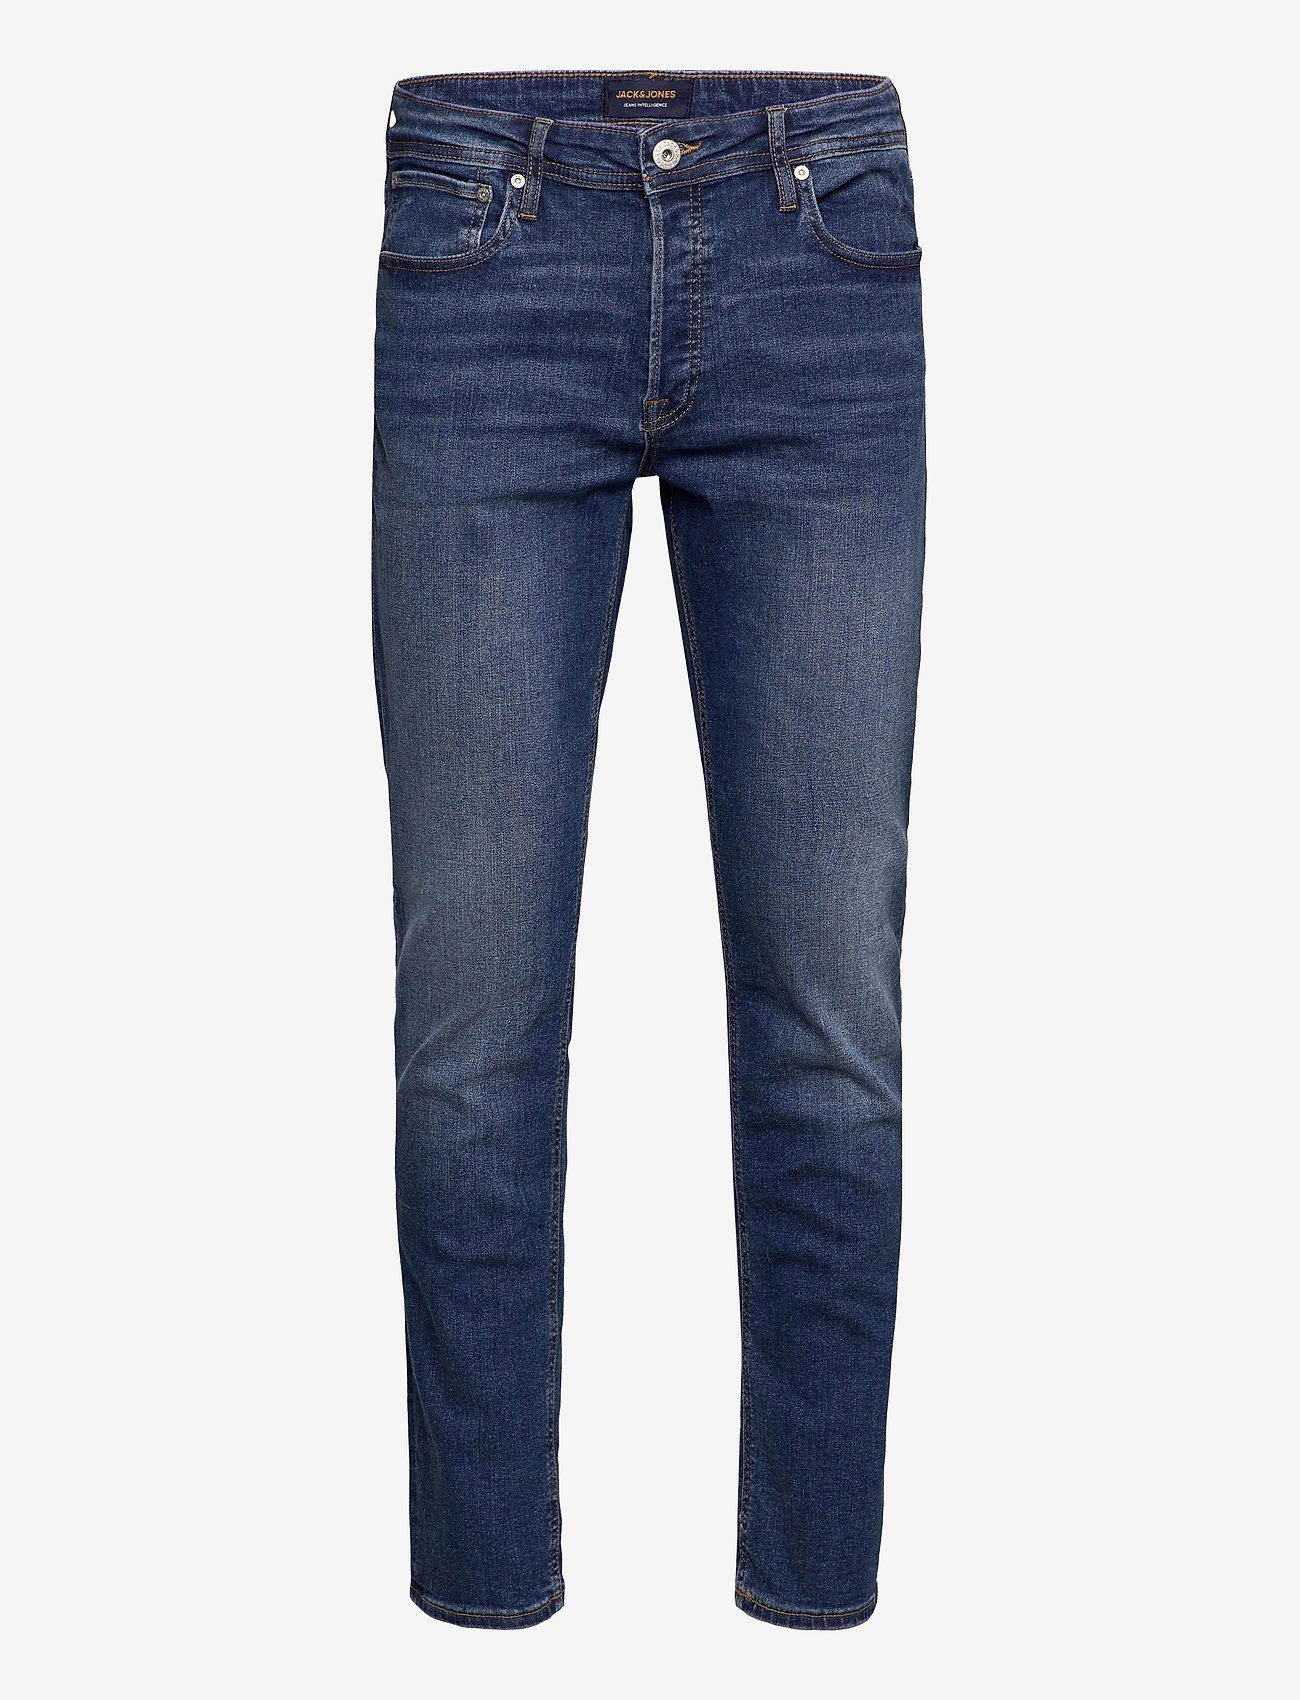 Jack & Jones - JJIMIKE JJORIGINAL AM 814 NOOS - regular jeans - blue denim - 0